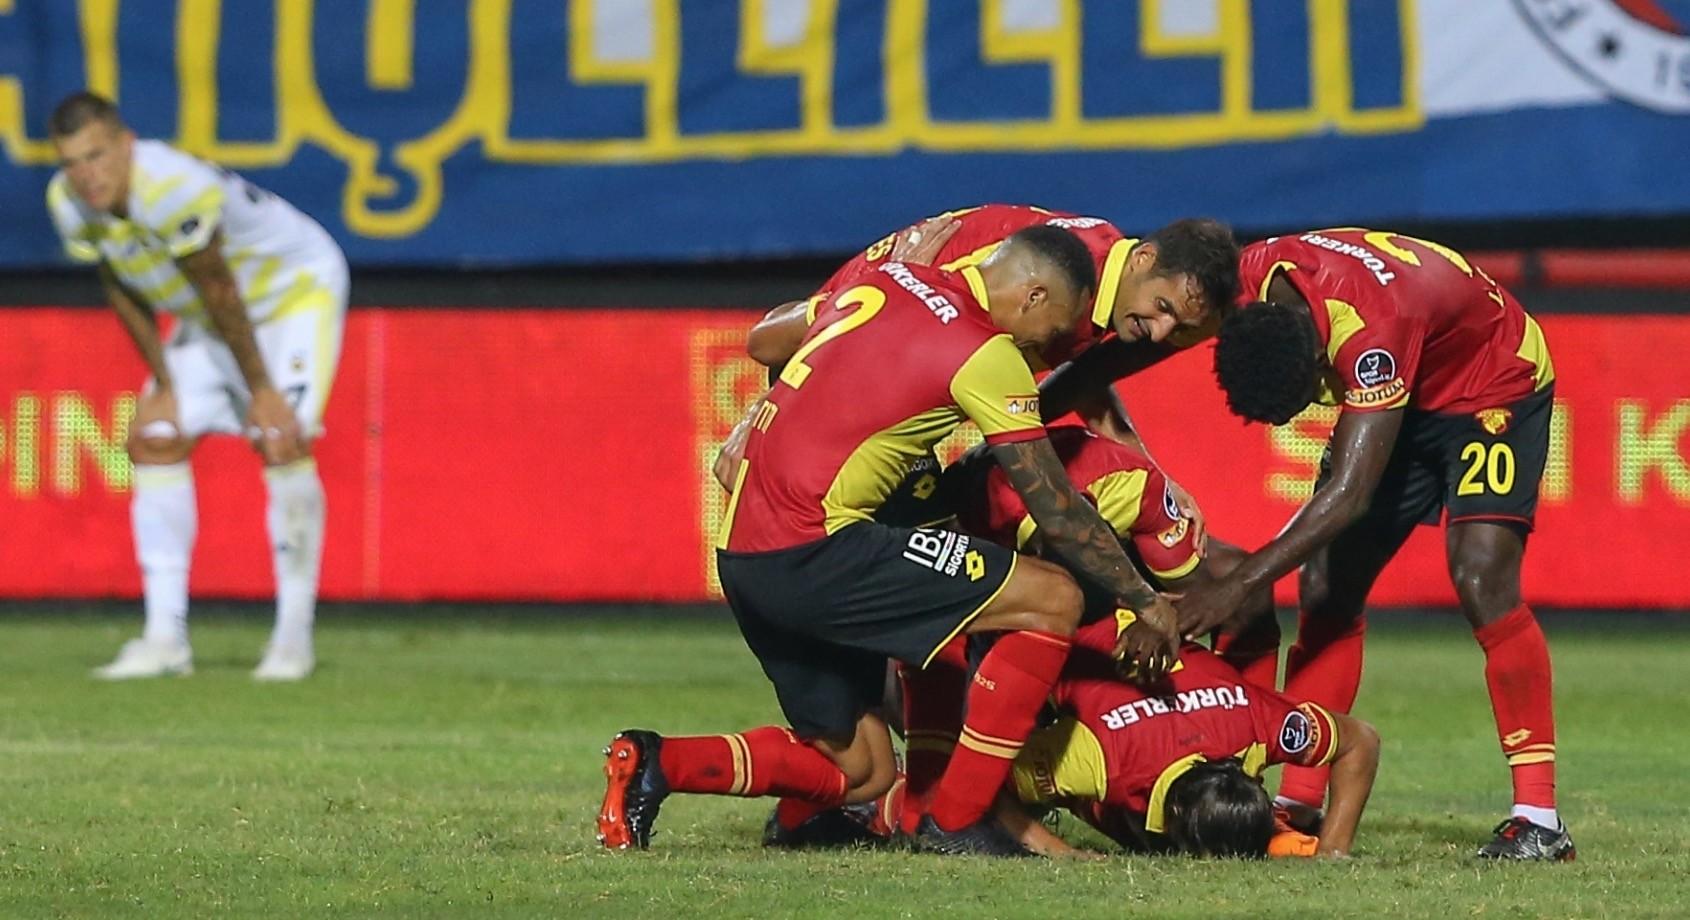 Gu00f6ztepe players celebrate their goal against Fenerbahu00e7e, Aug. 25.